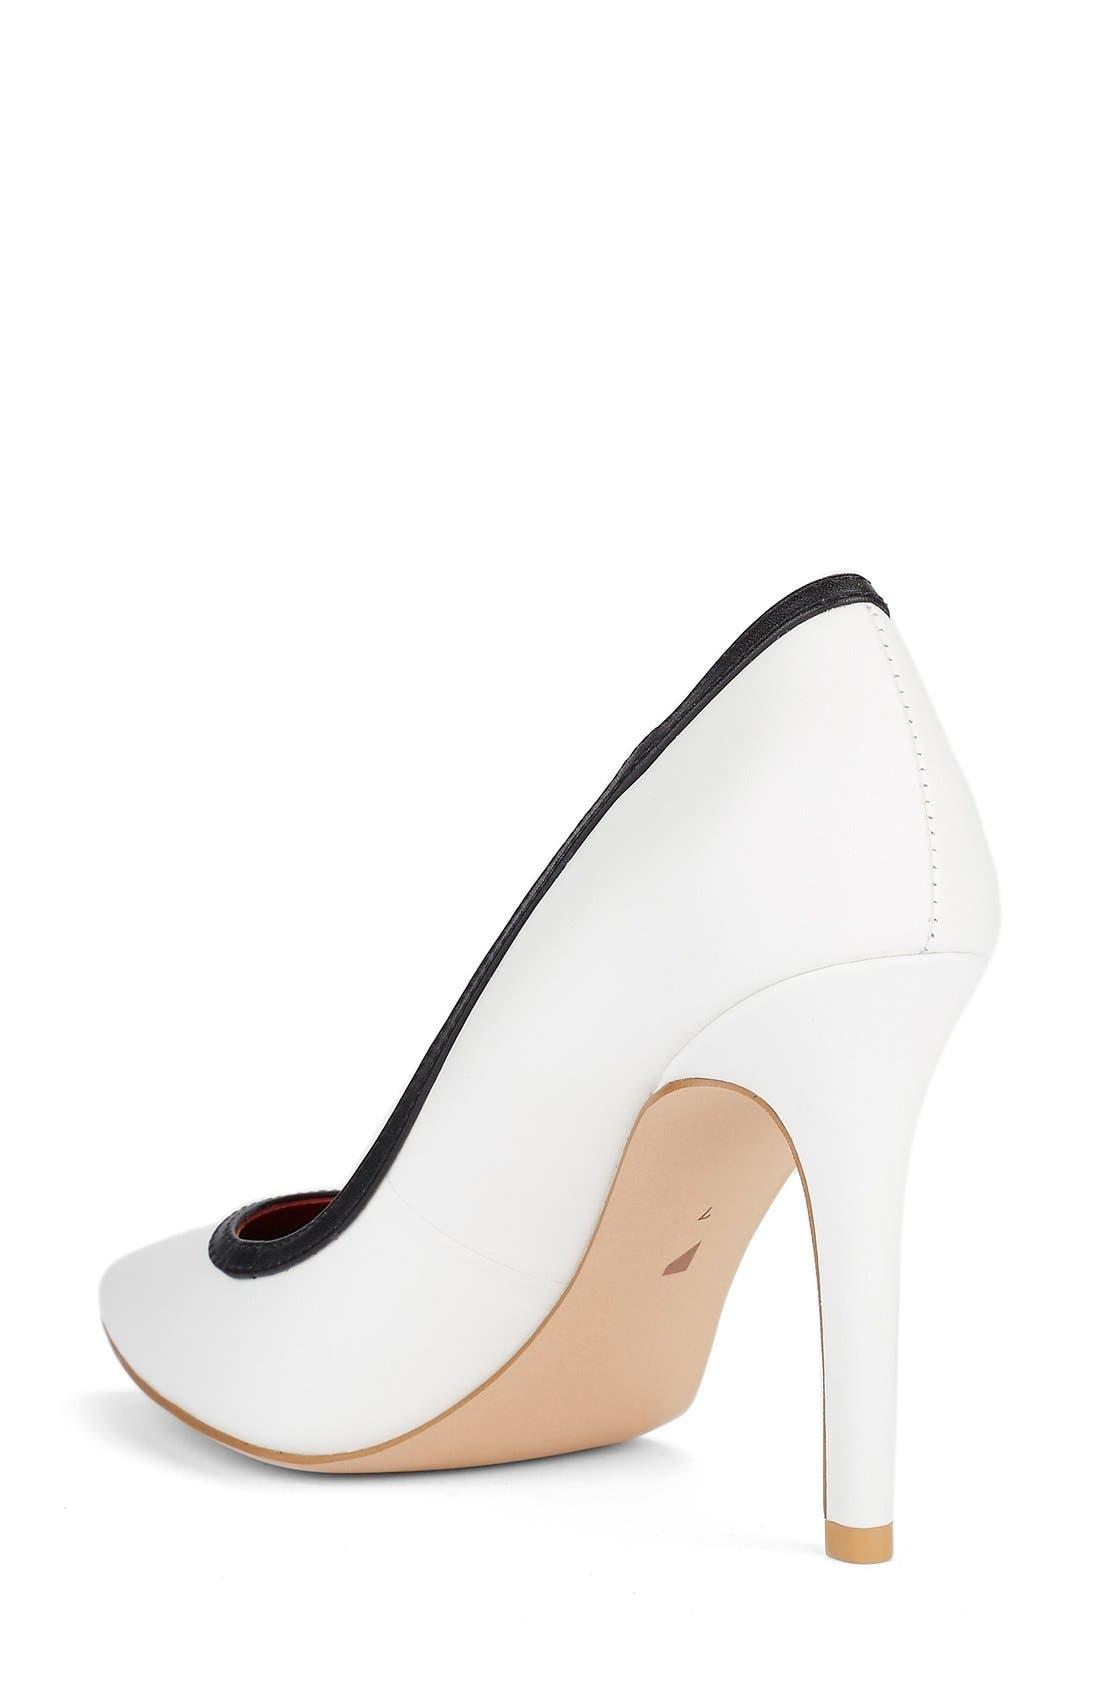 Alternate Image 2  - Shoes of Prey x Kim Jones La Dolce Vita Collection Pointy Toe Pump (Women)